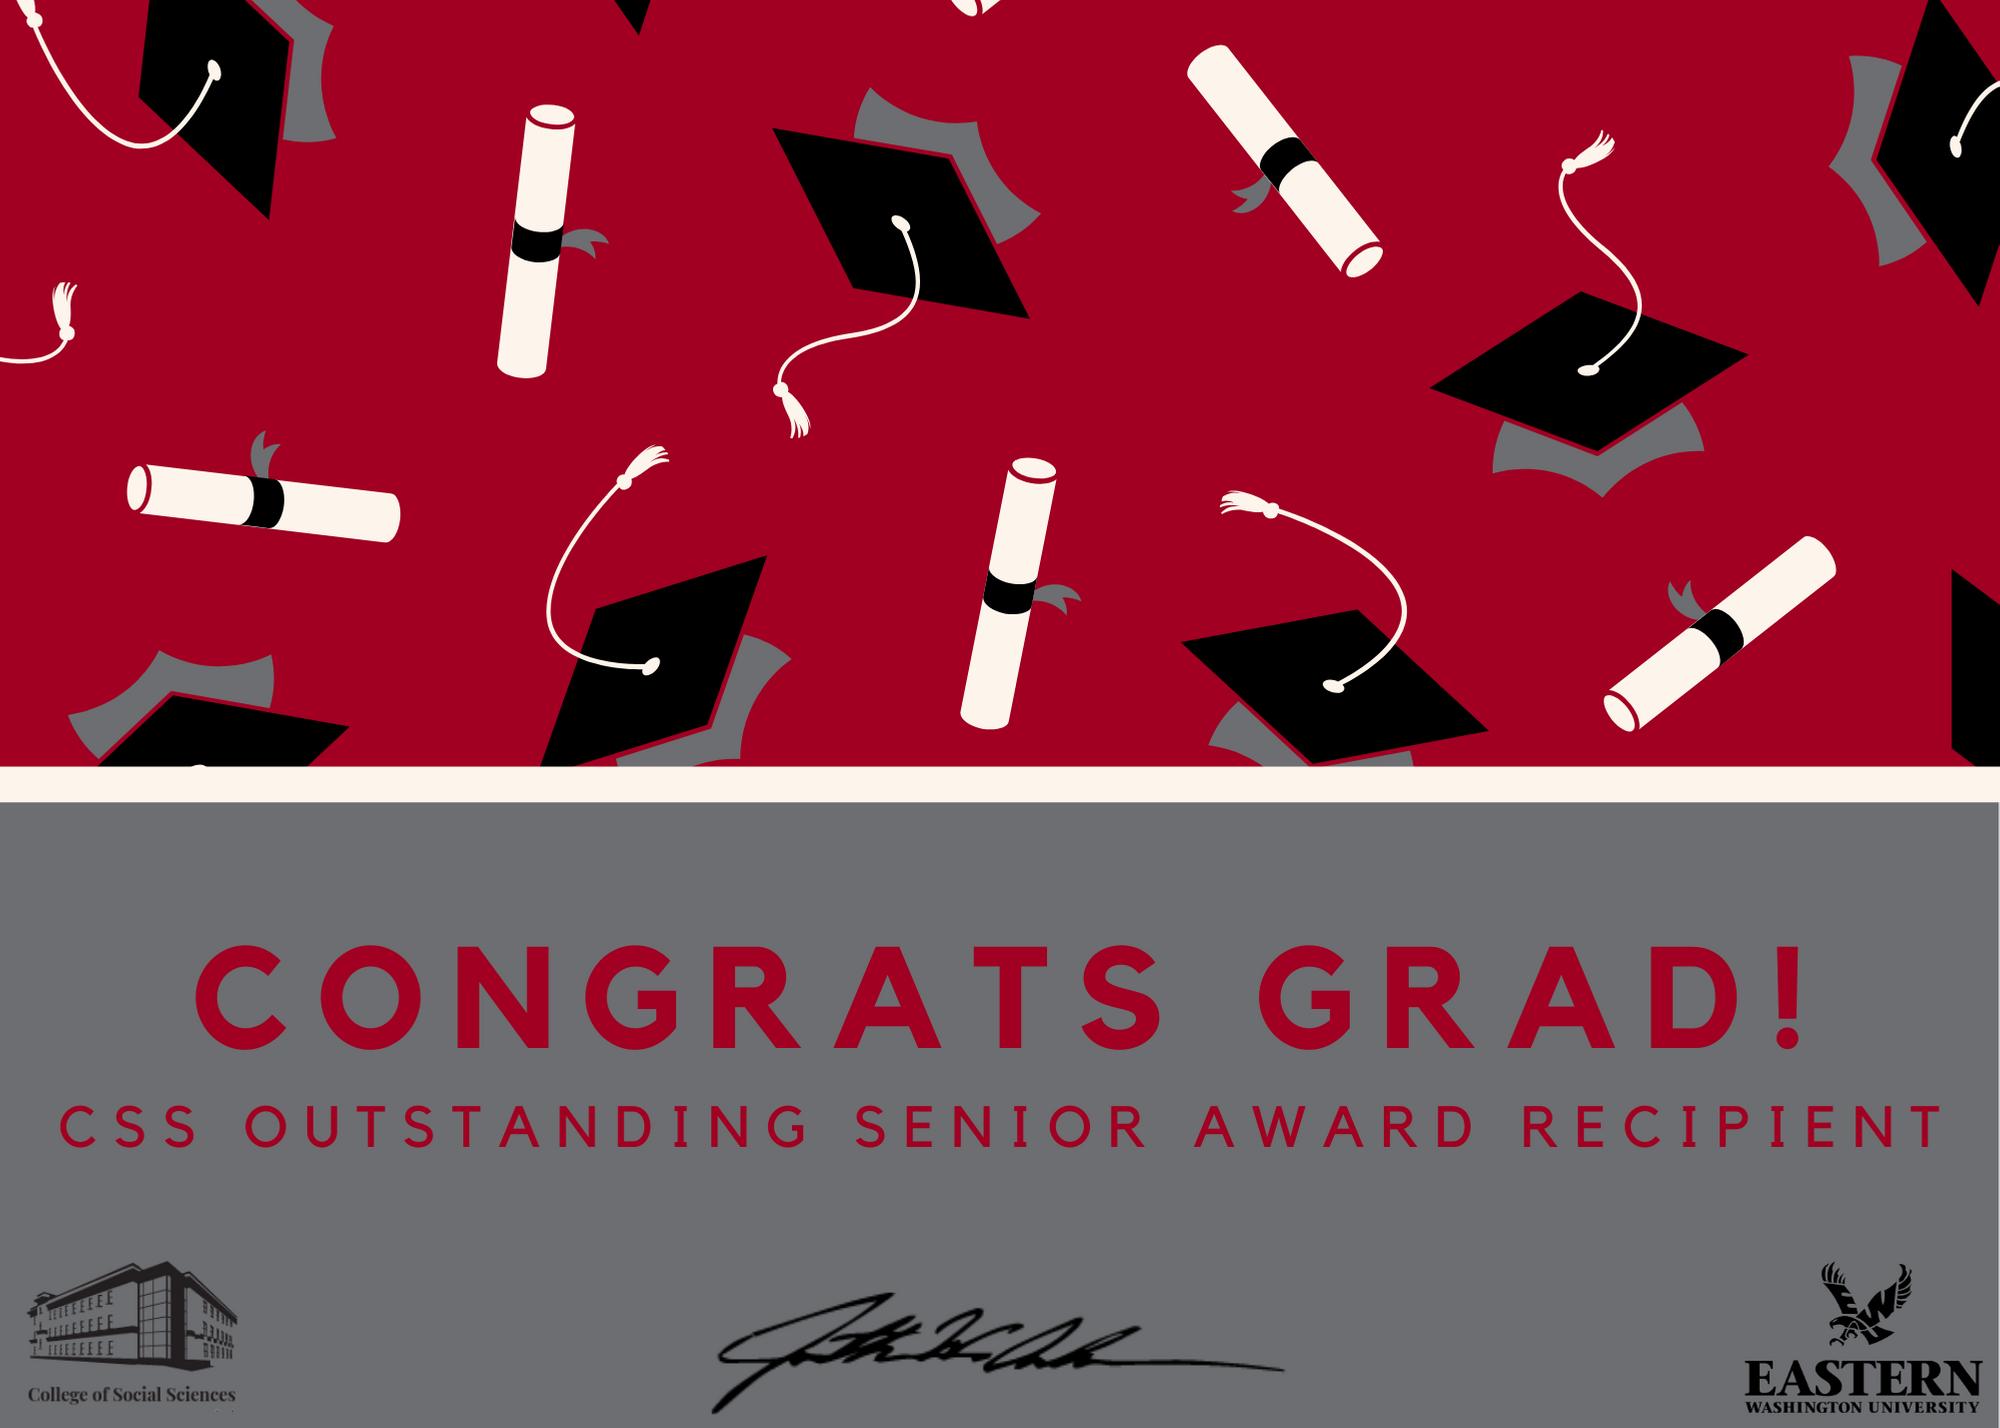 2054-caps-and-diplomas-pattern-graduation-card-2.png